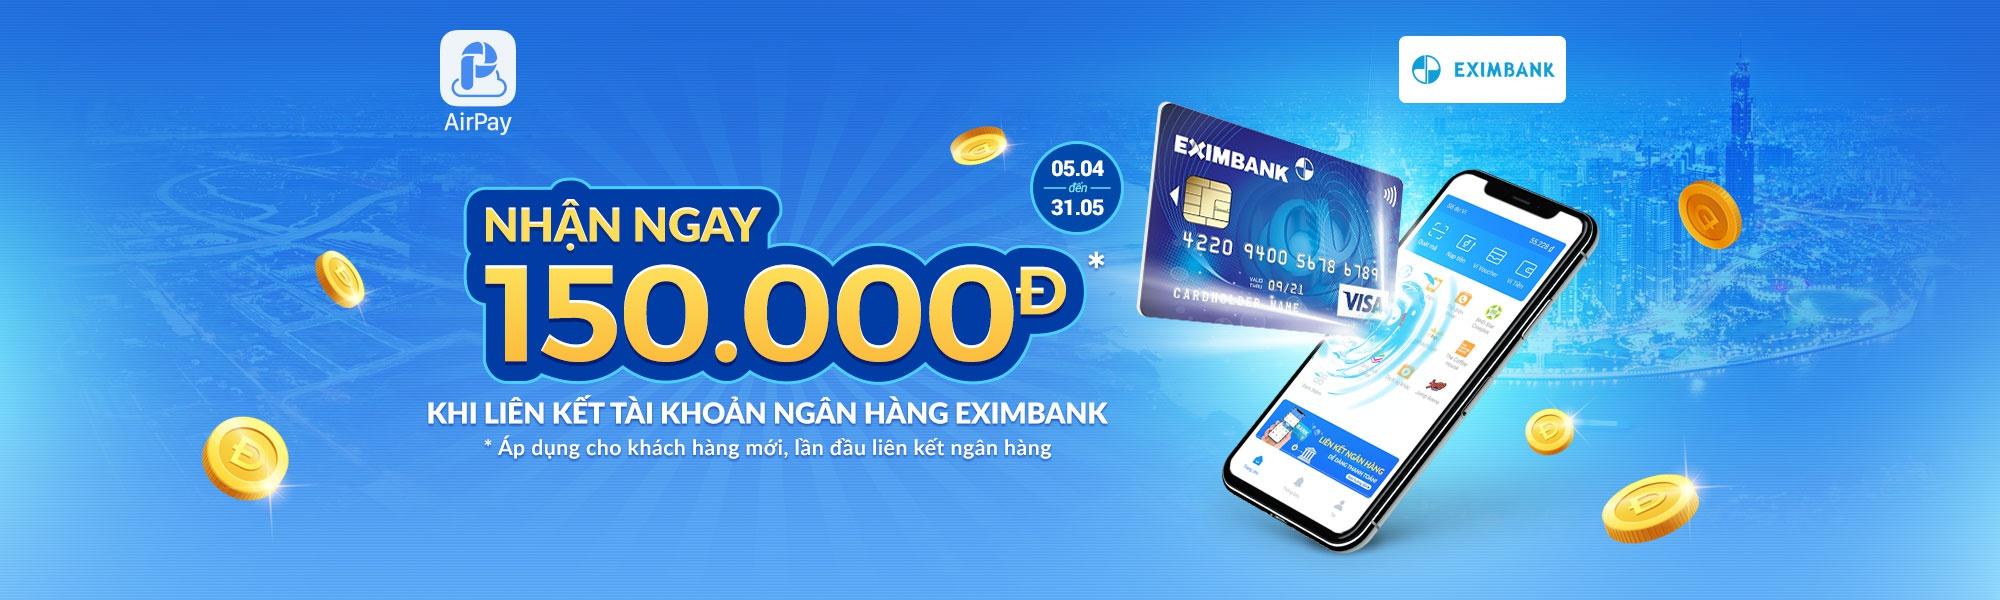 eximbank-promotion-2019